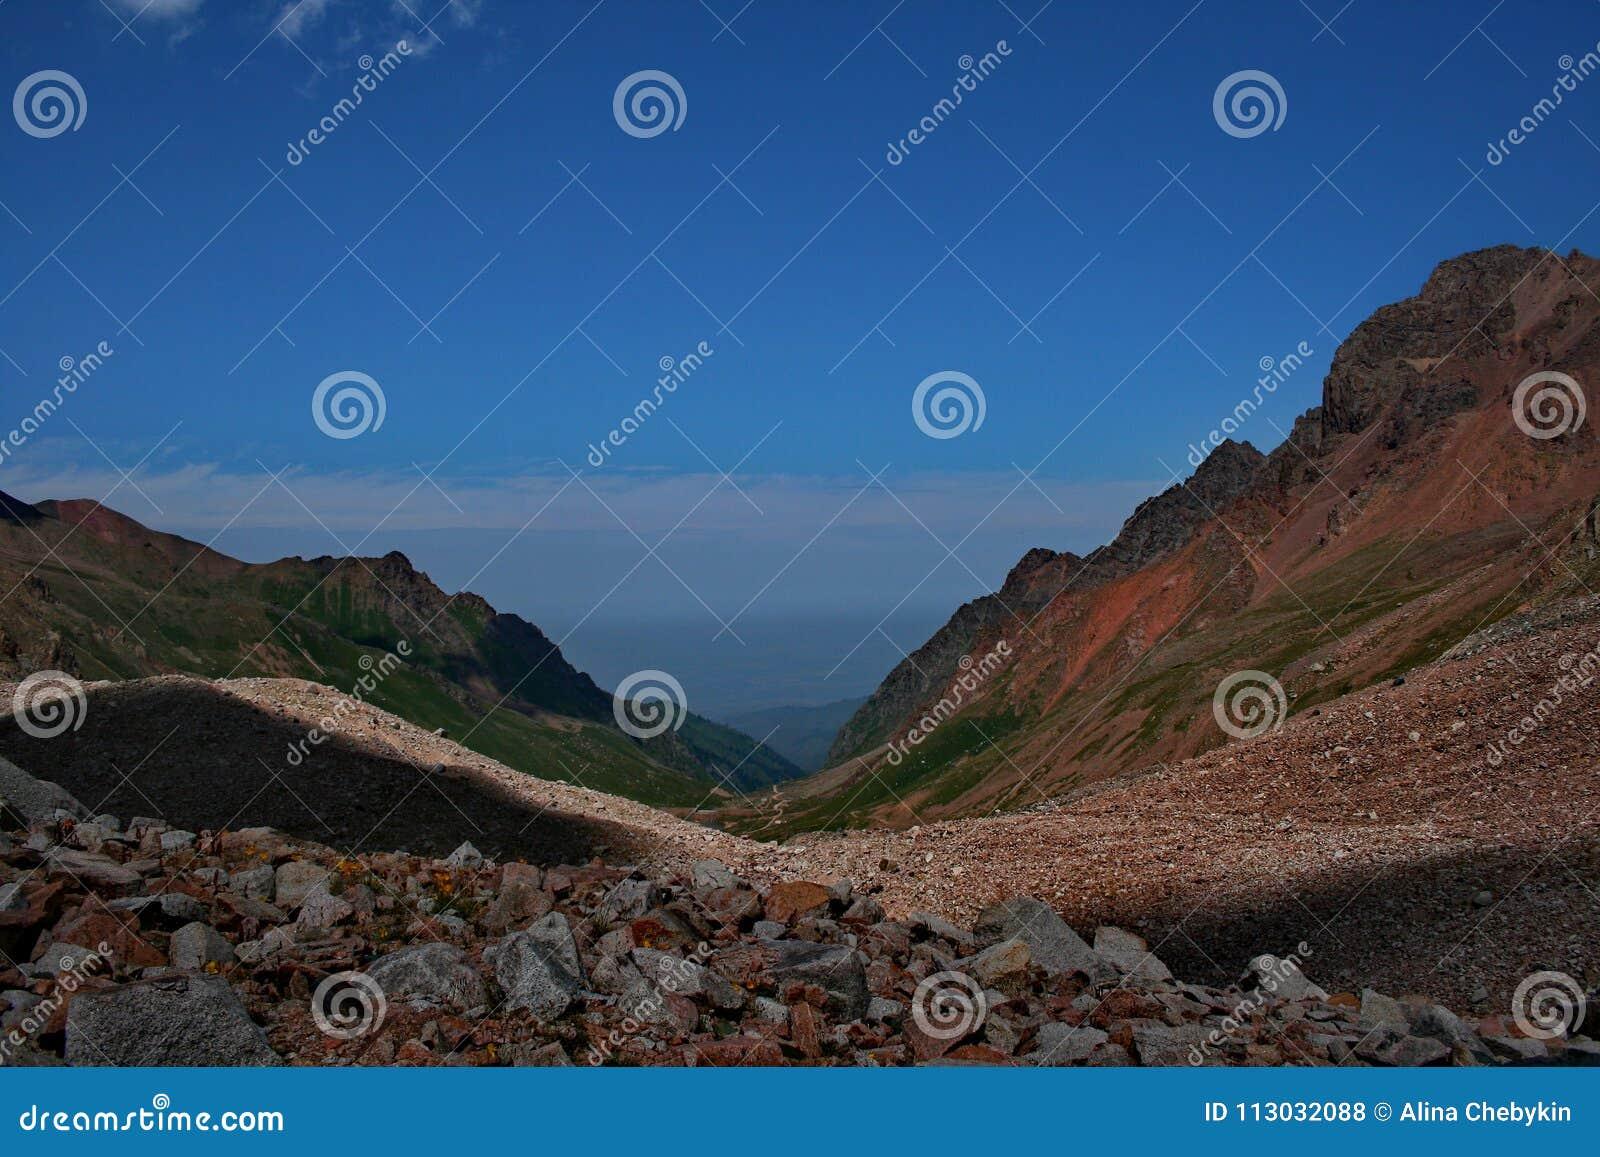 Fotos de las montañas en Kazajistán